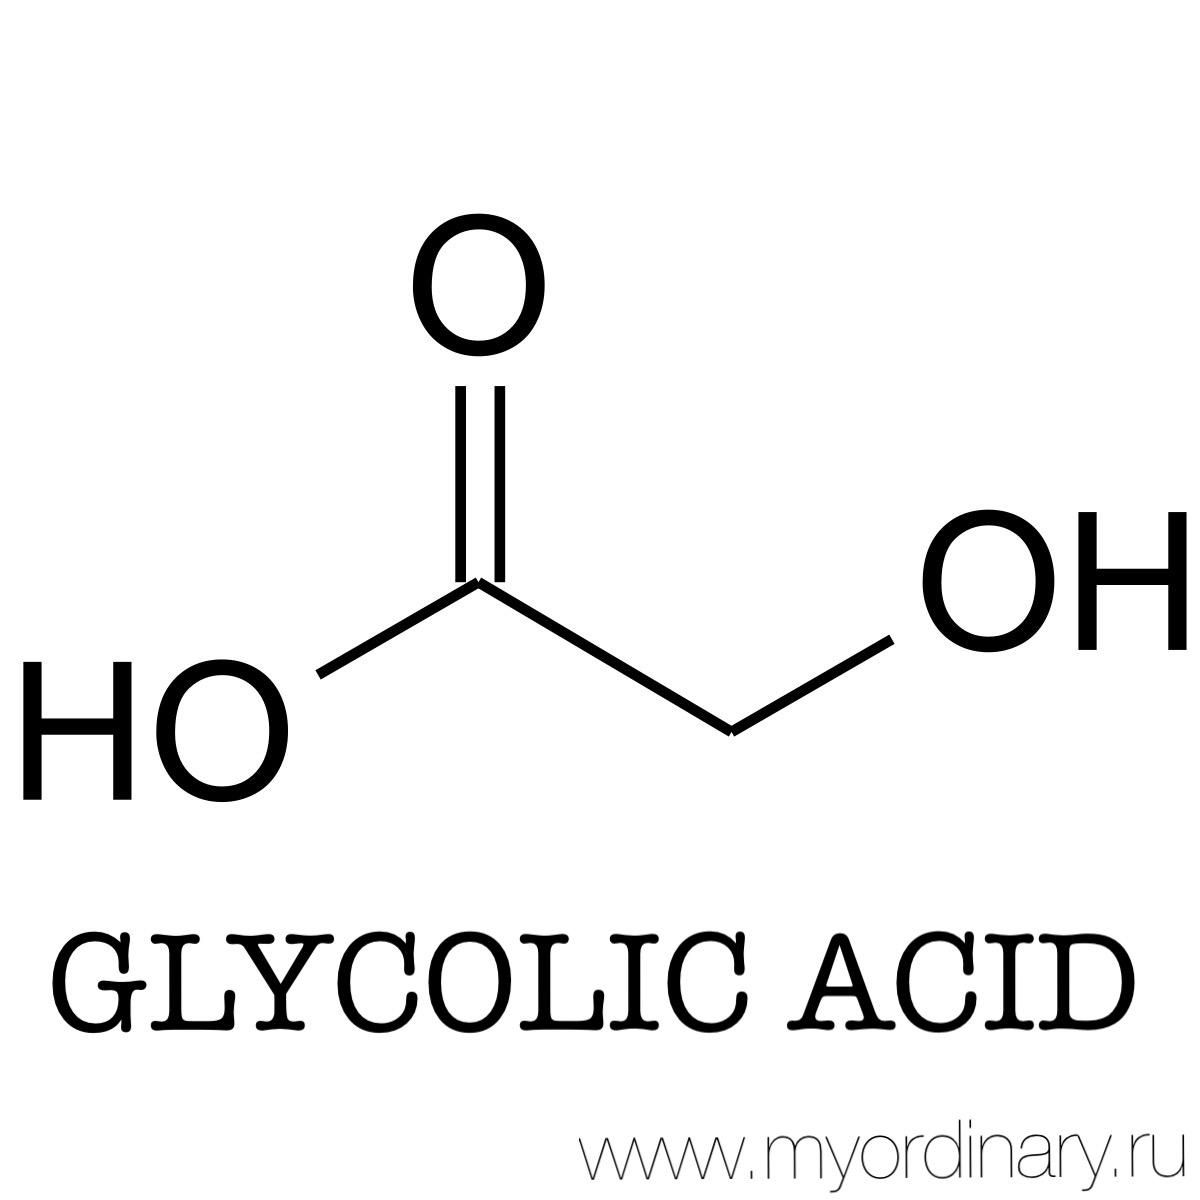 Glycolic